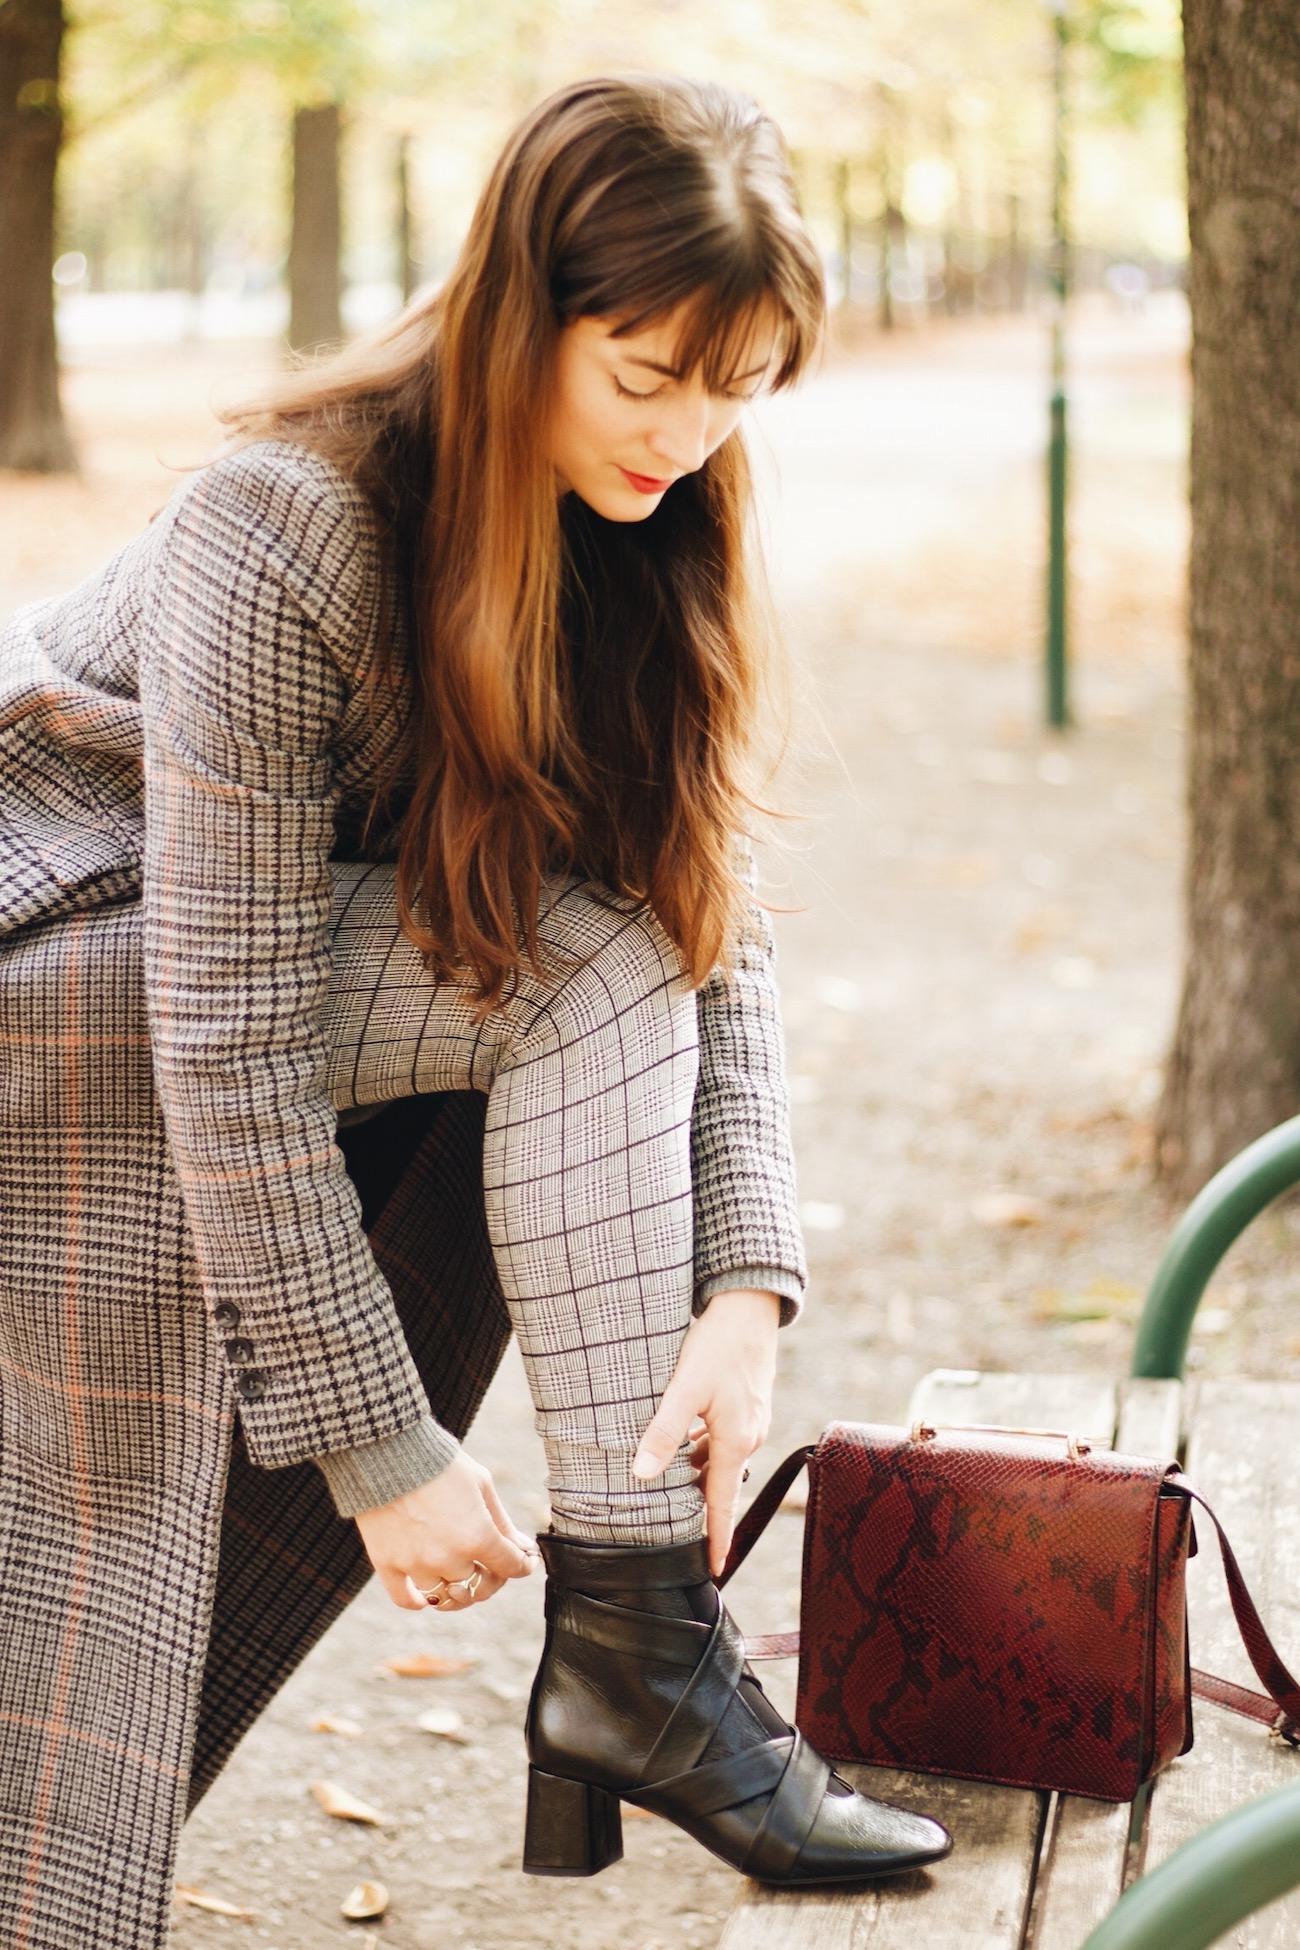 Karomuster Modetrend Herbst Winter 2016 Karierter Mantel H&M Modeblog Fashionpost